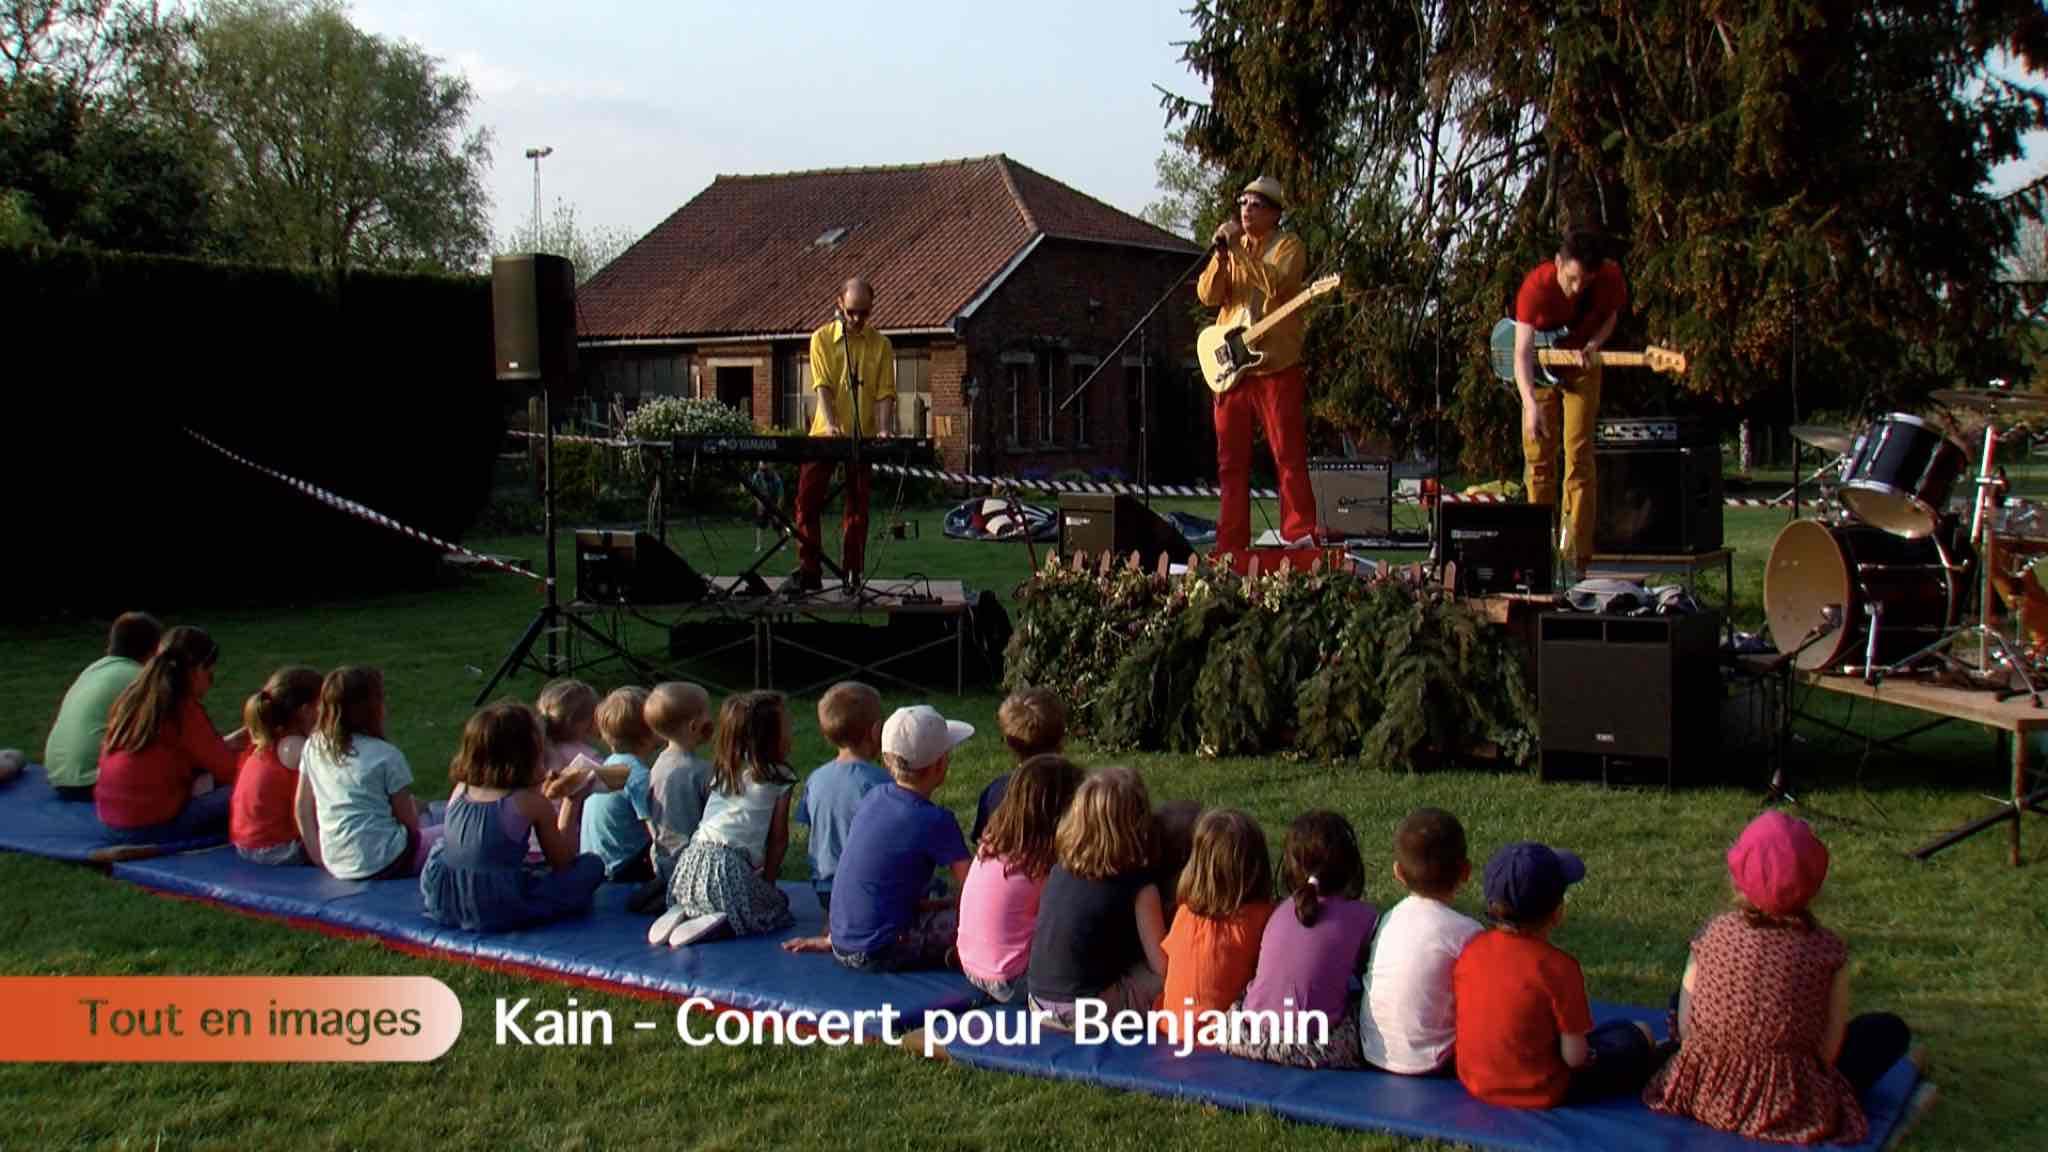 Concert pour Benjamin